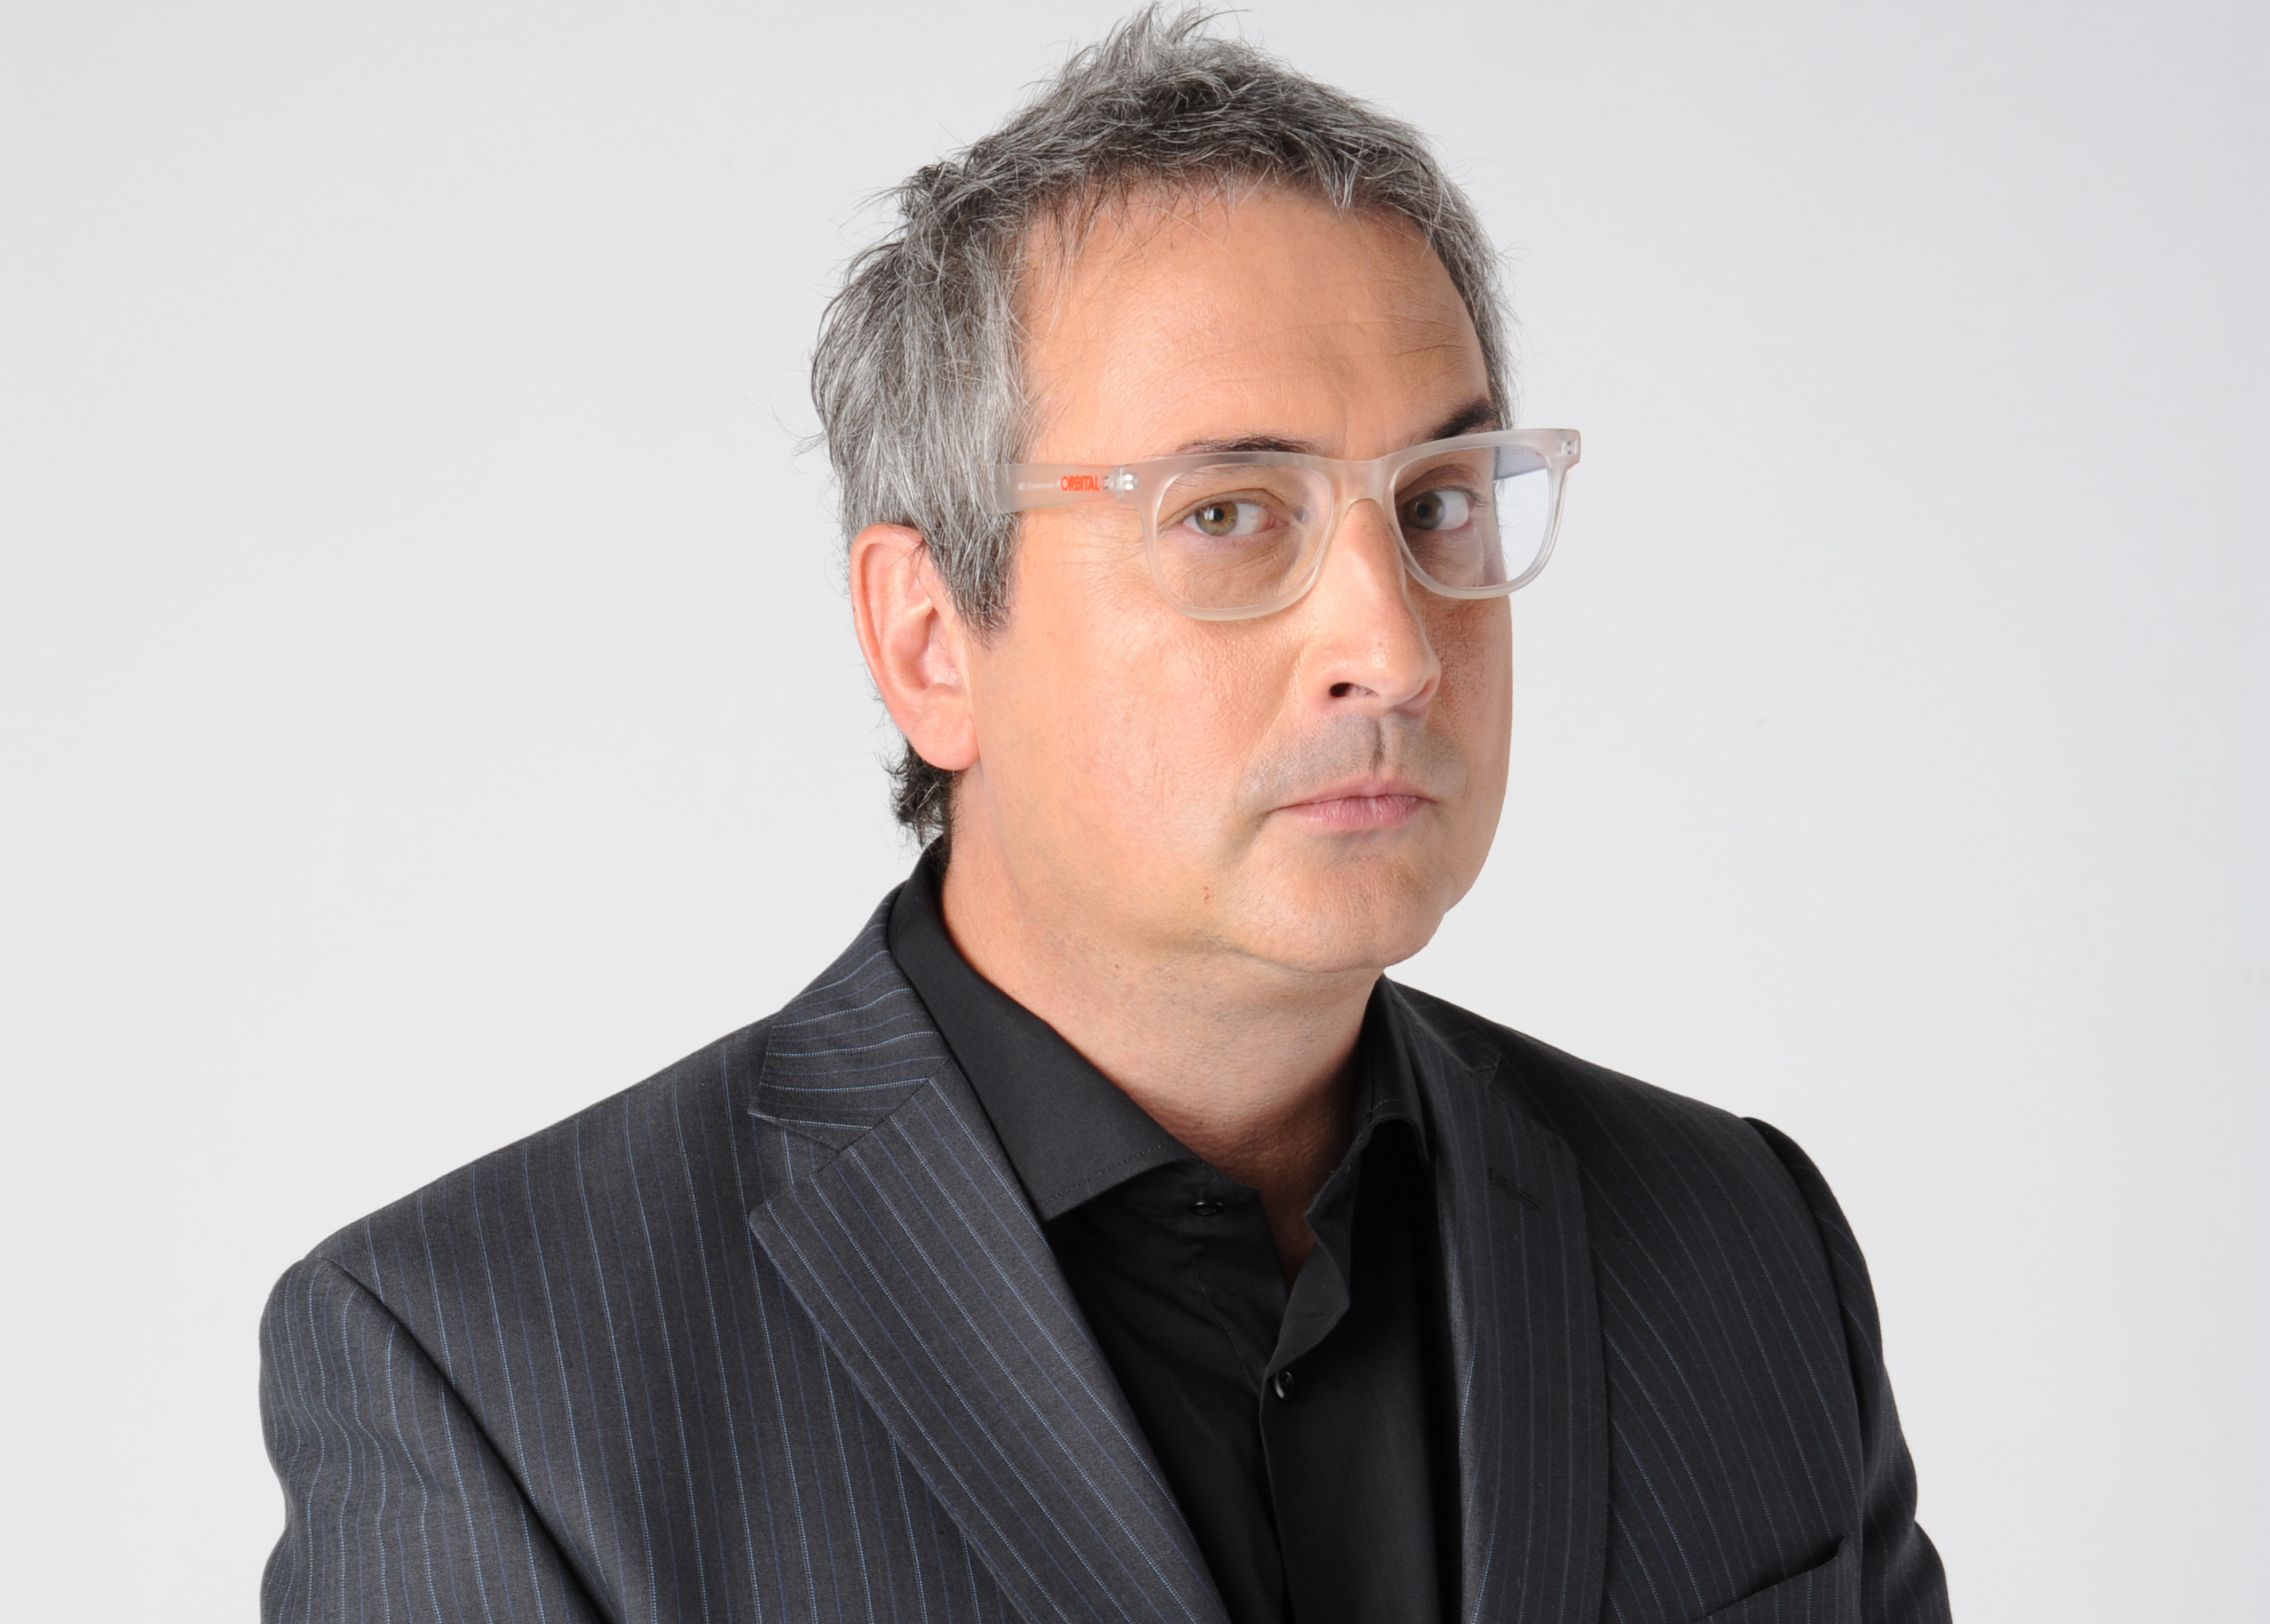 Luis-Rubio-03crop